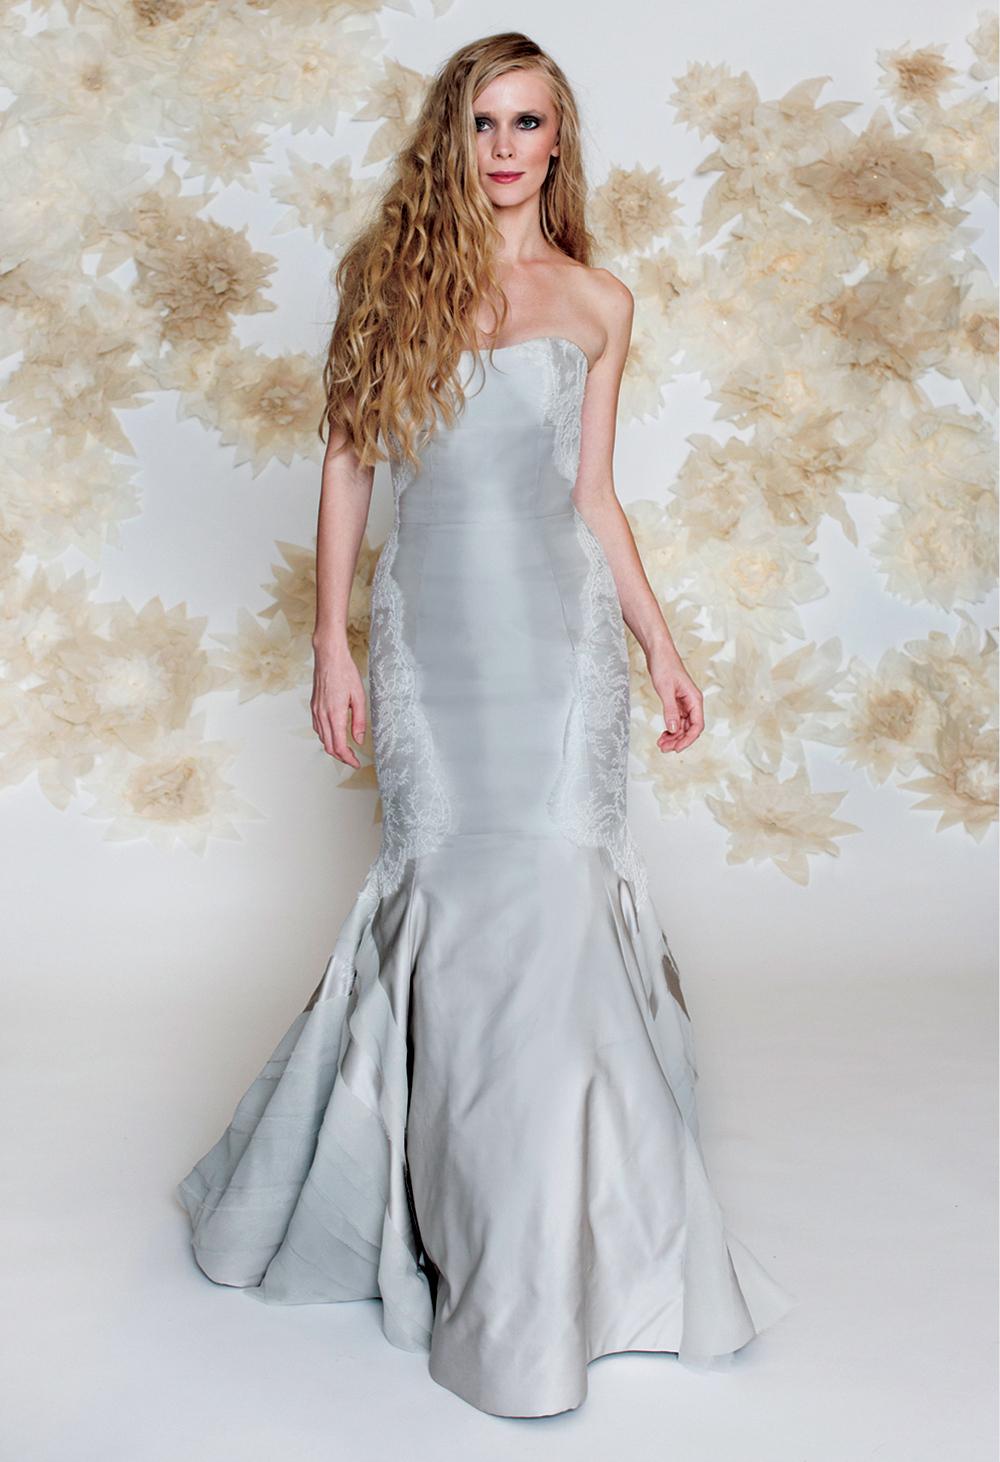 Tara-latour-wedding-dresses-utah-theola.full